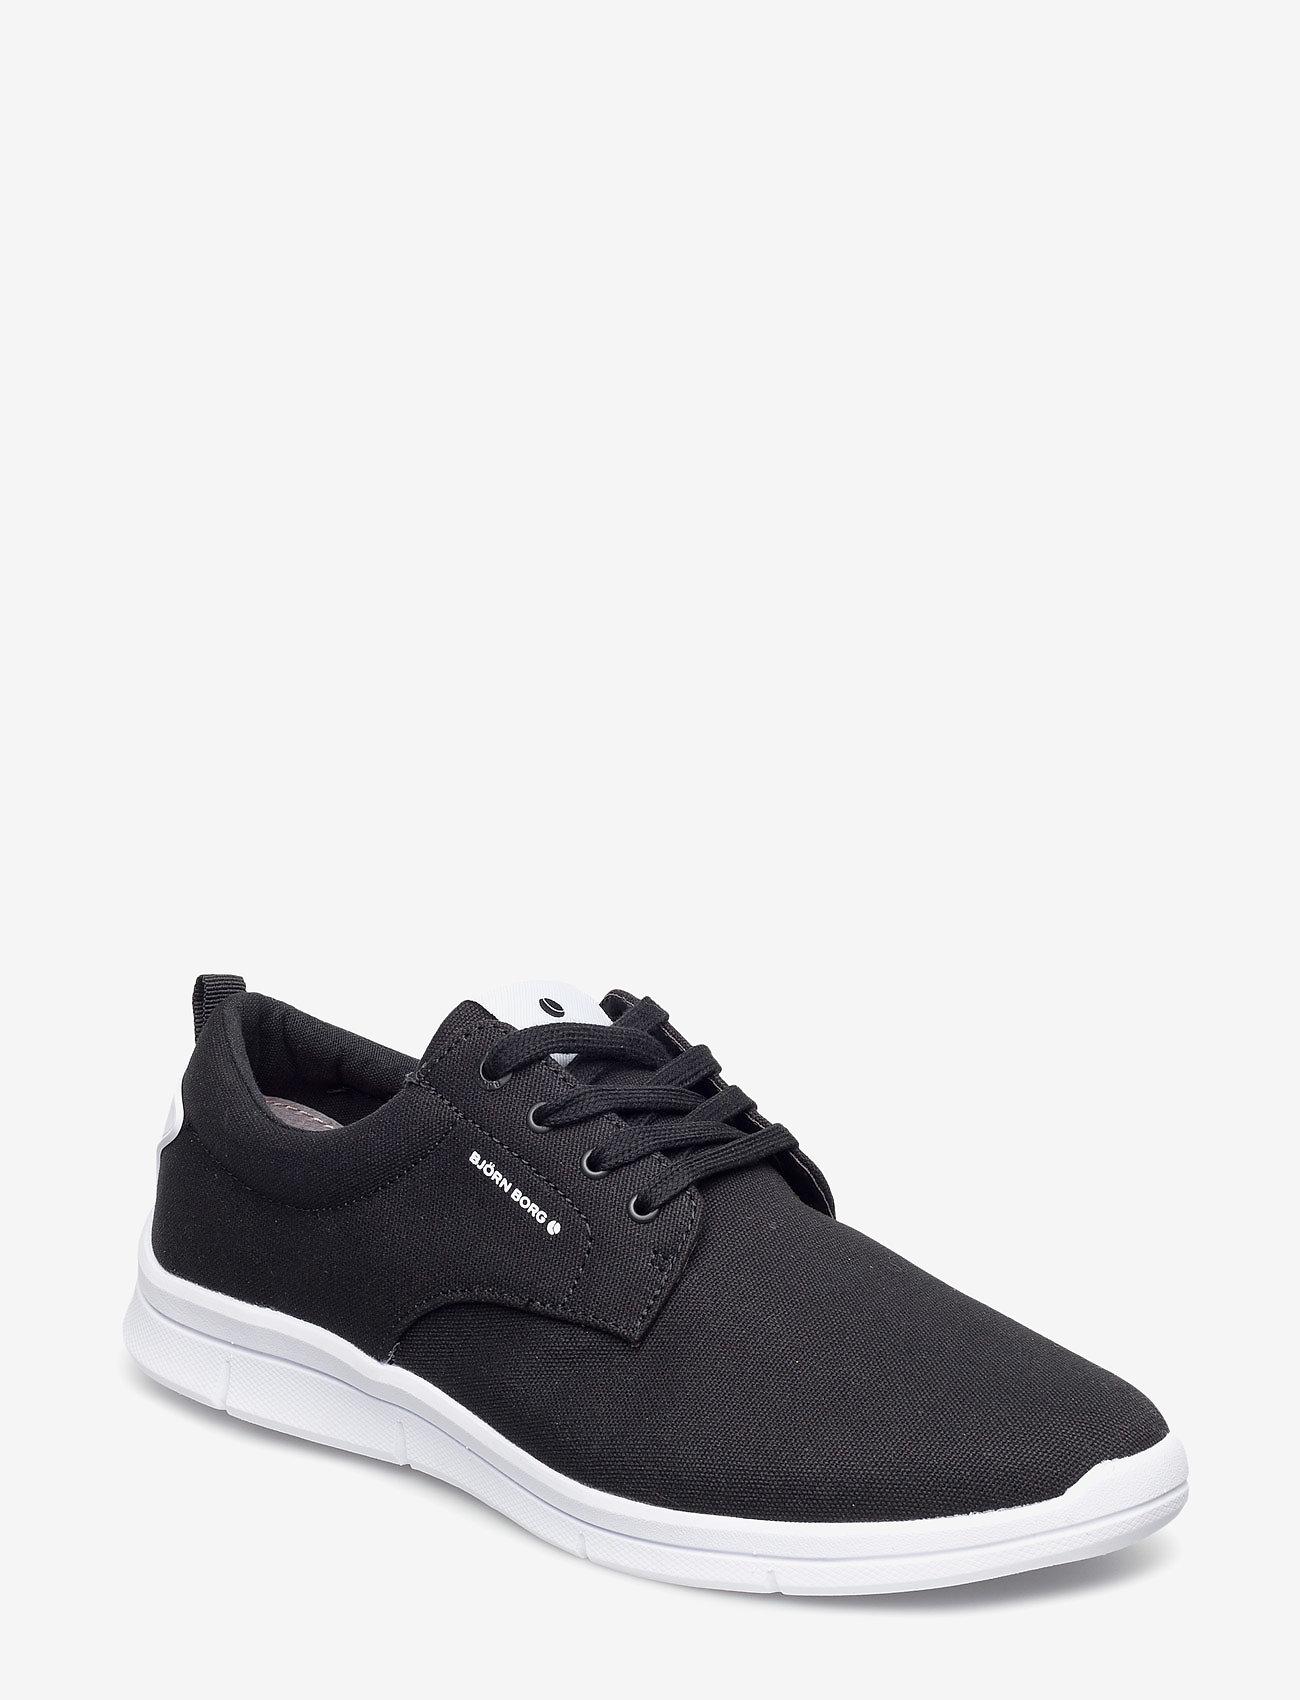 Björn Borg - X200 Low Cvs M - laag sneakers - black - 0